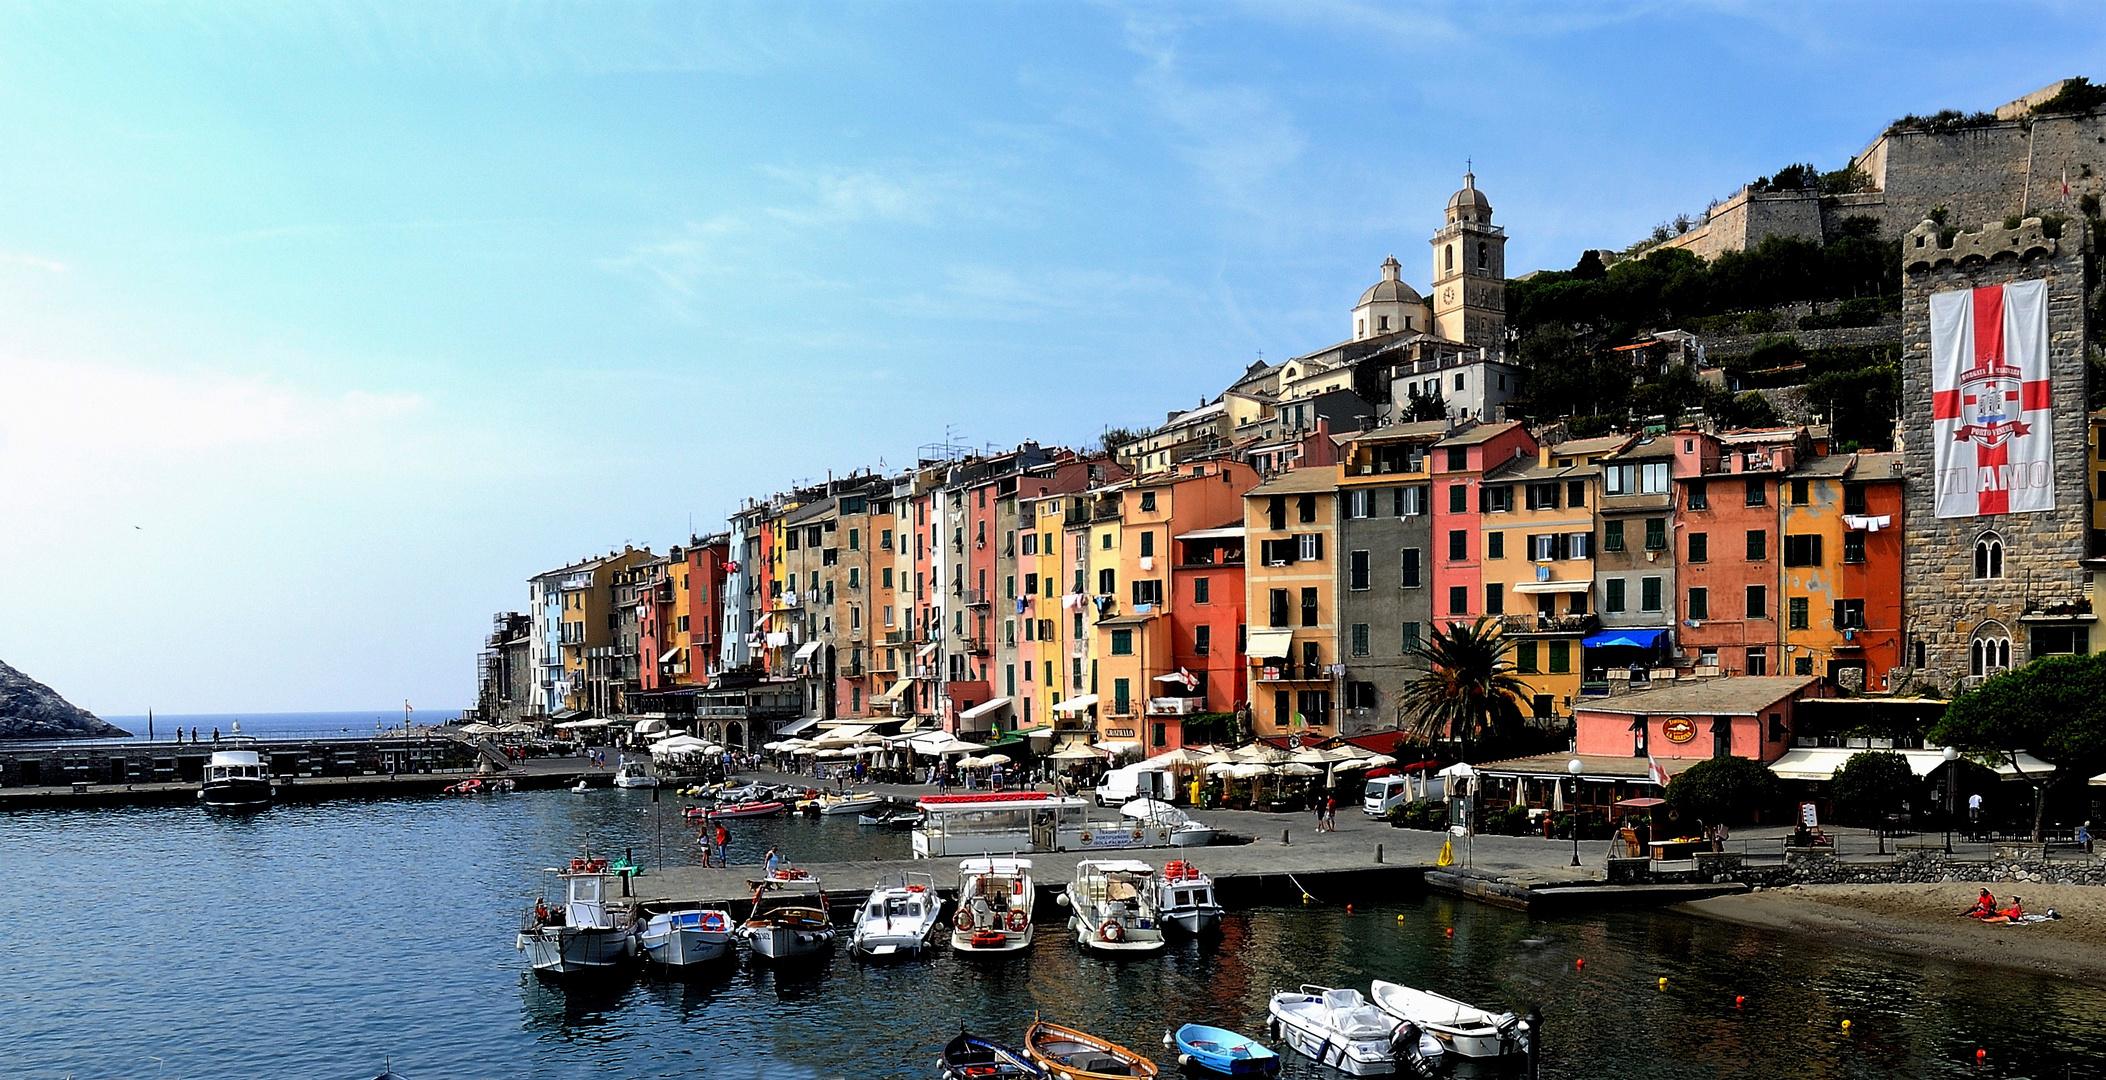 Italy - Portovenere no comment